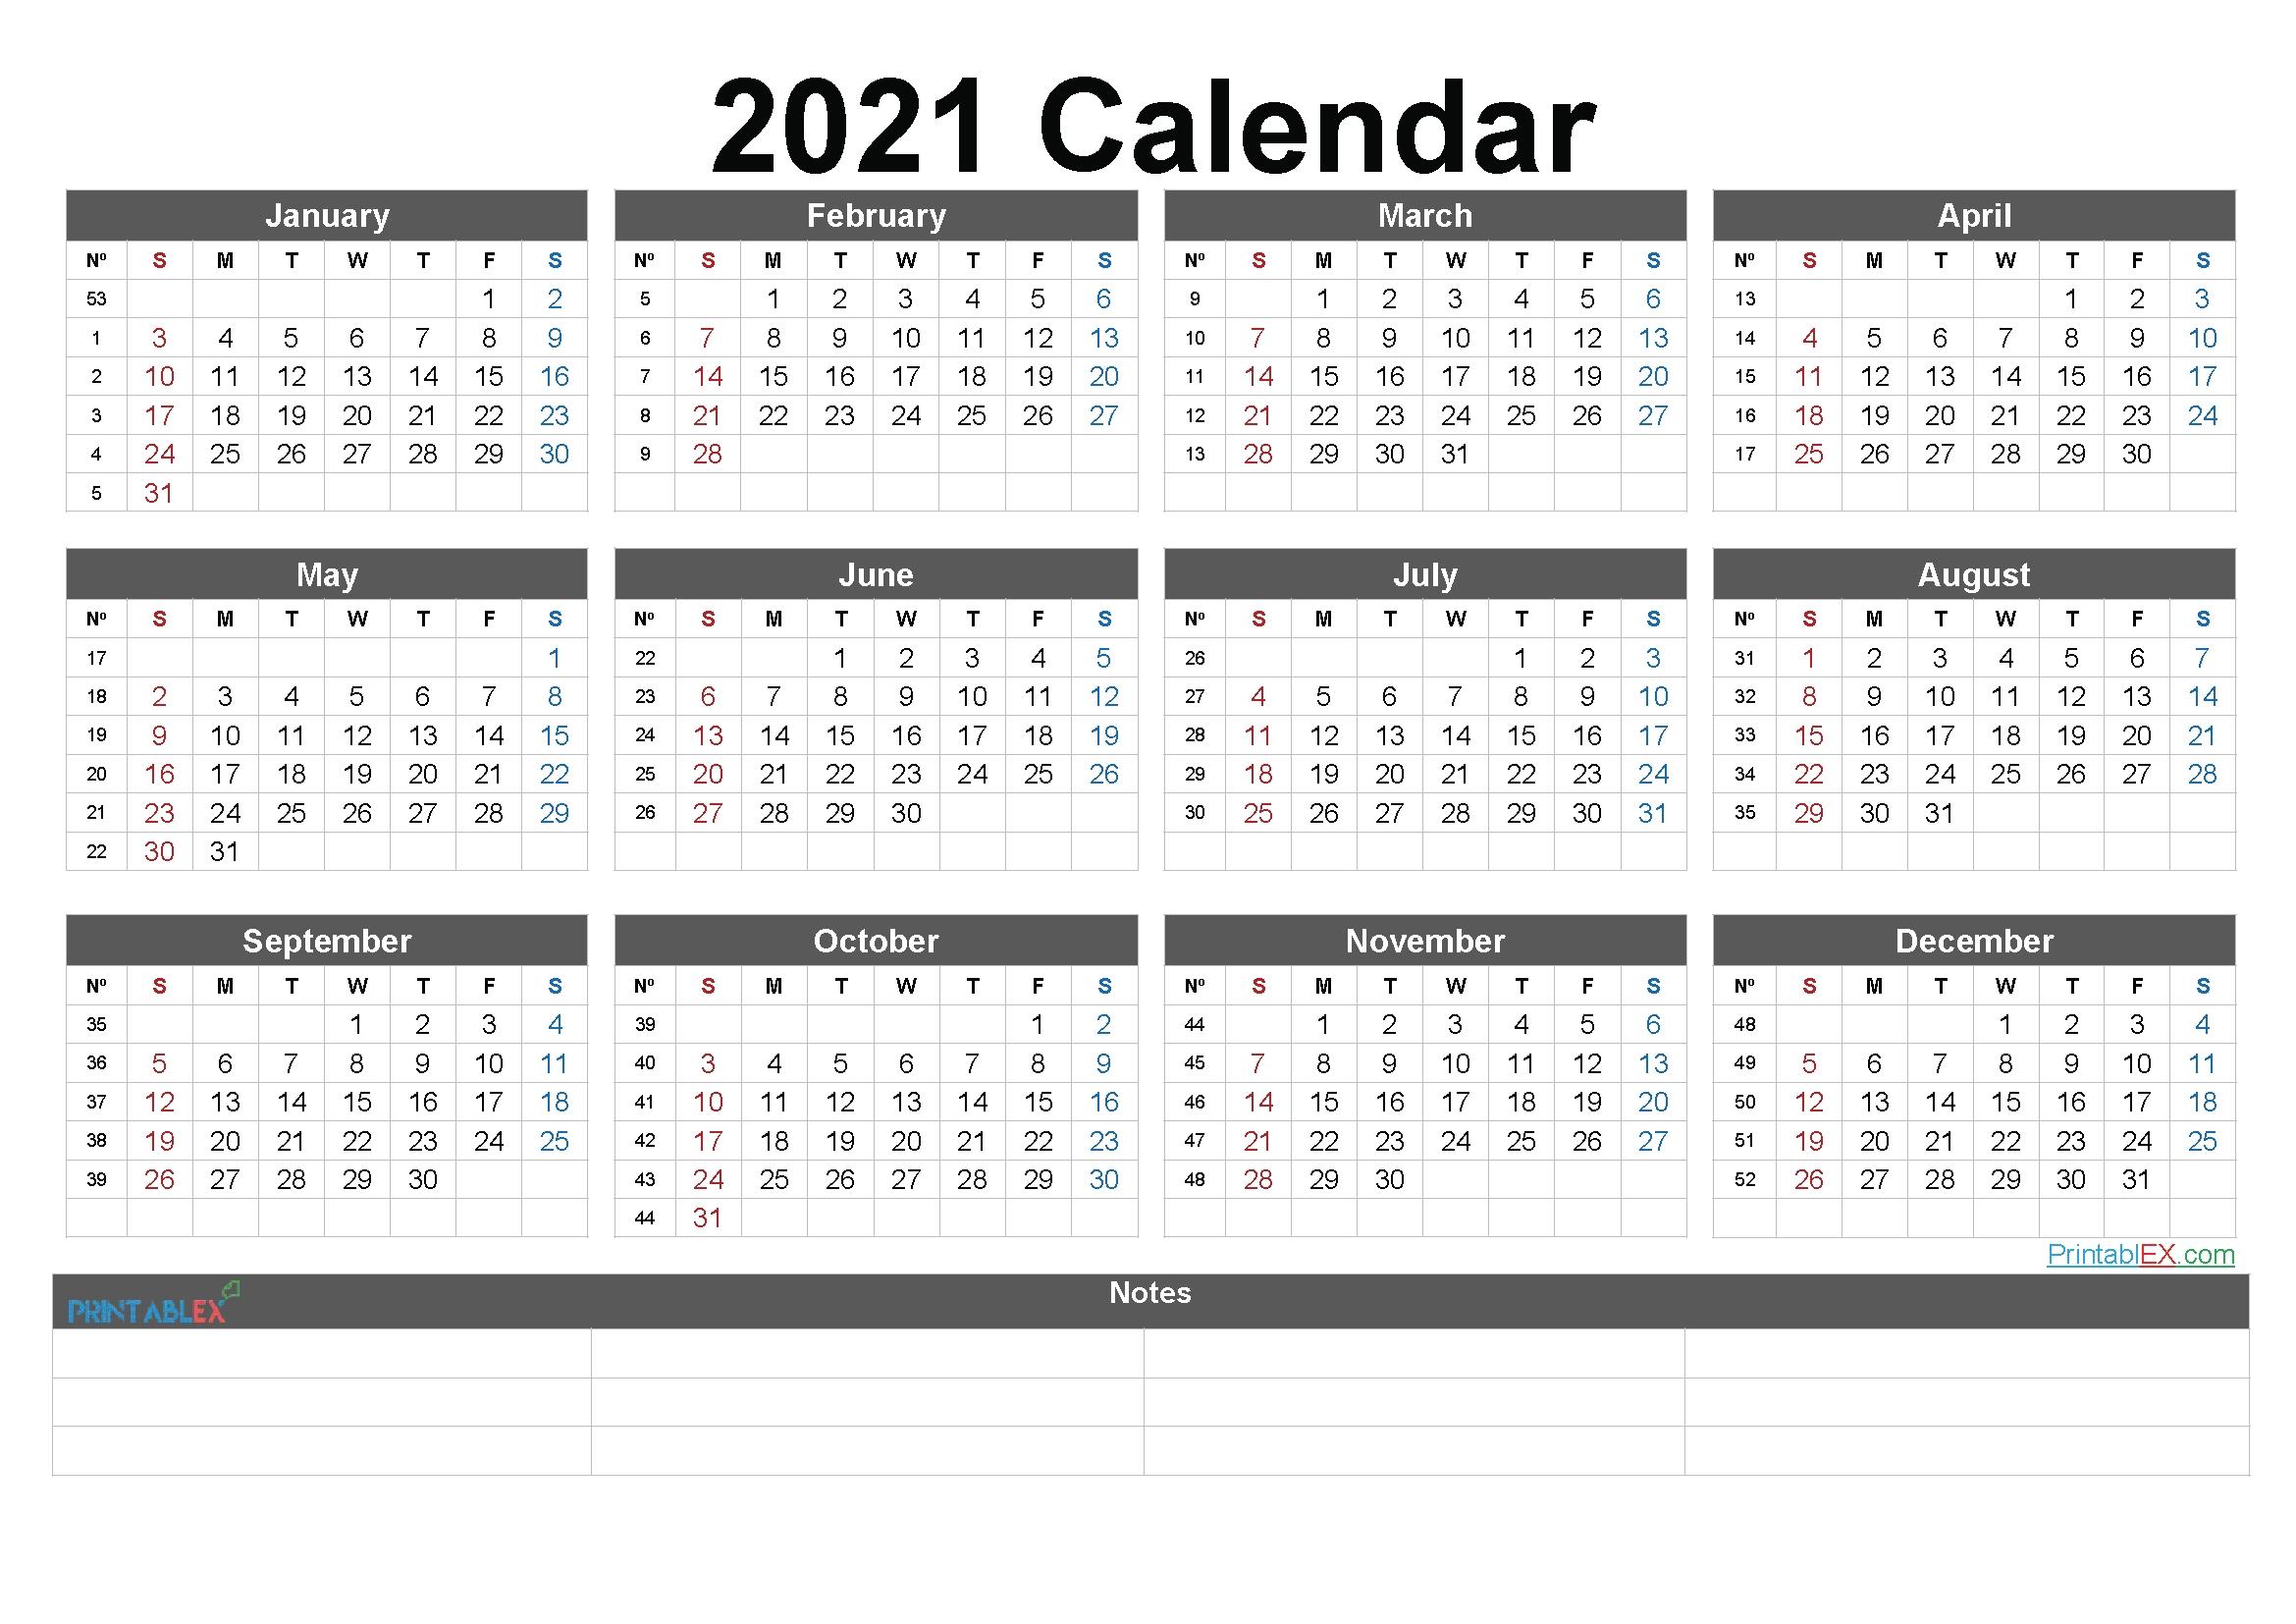 2021 Calendar With Week Numbers To Print | Free Printable Calendar in 2021 Julian Date Calendar Graphics